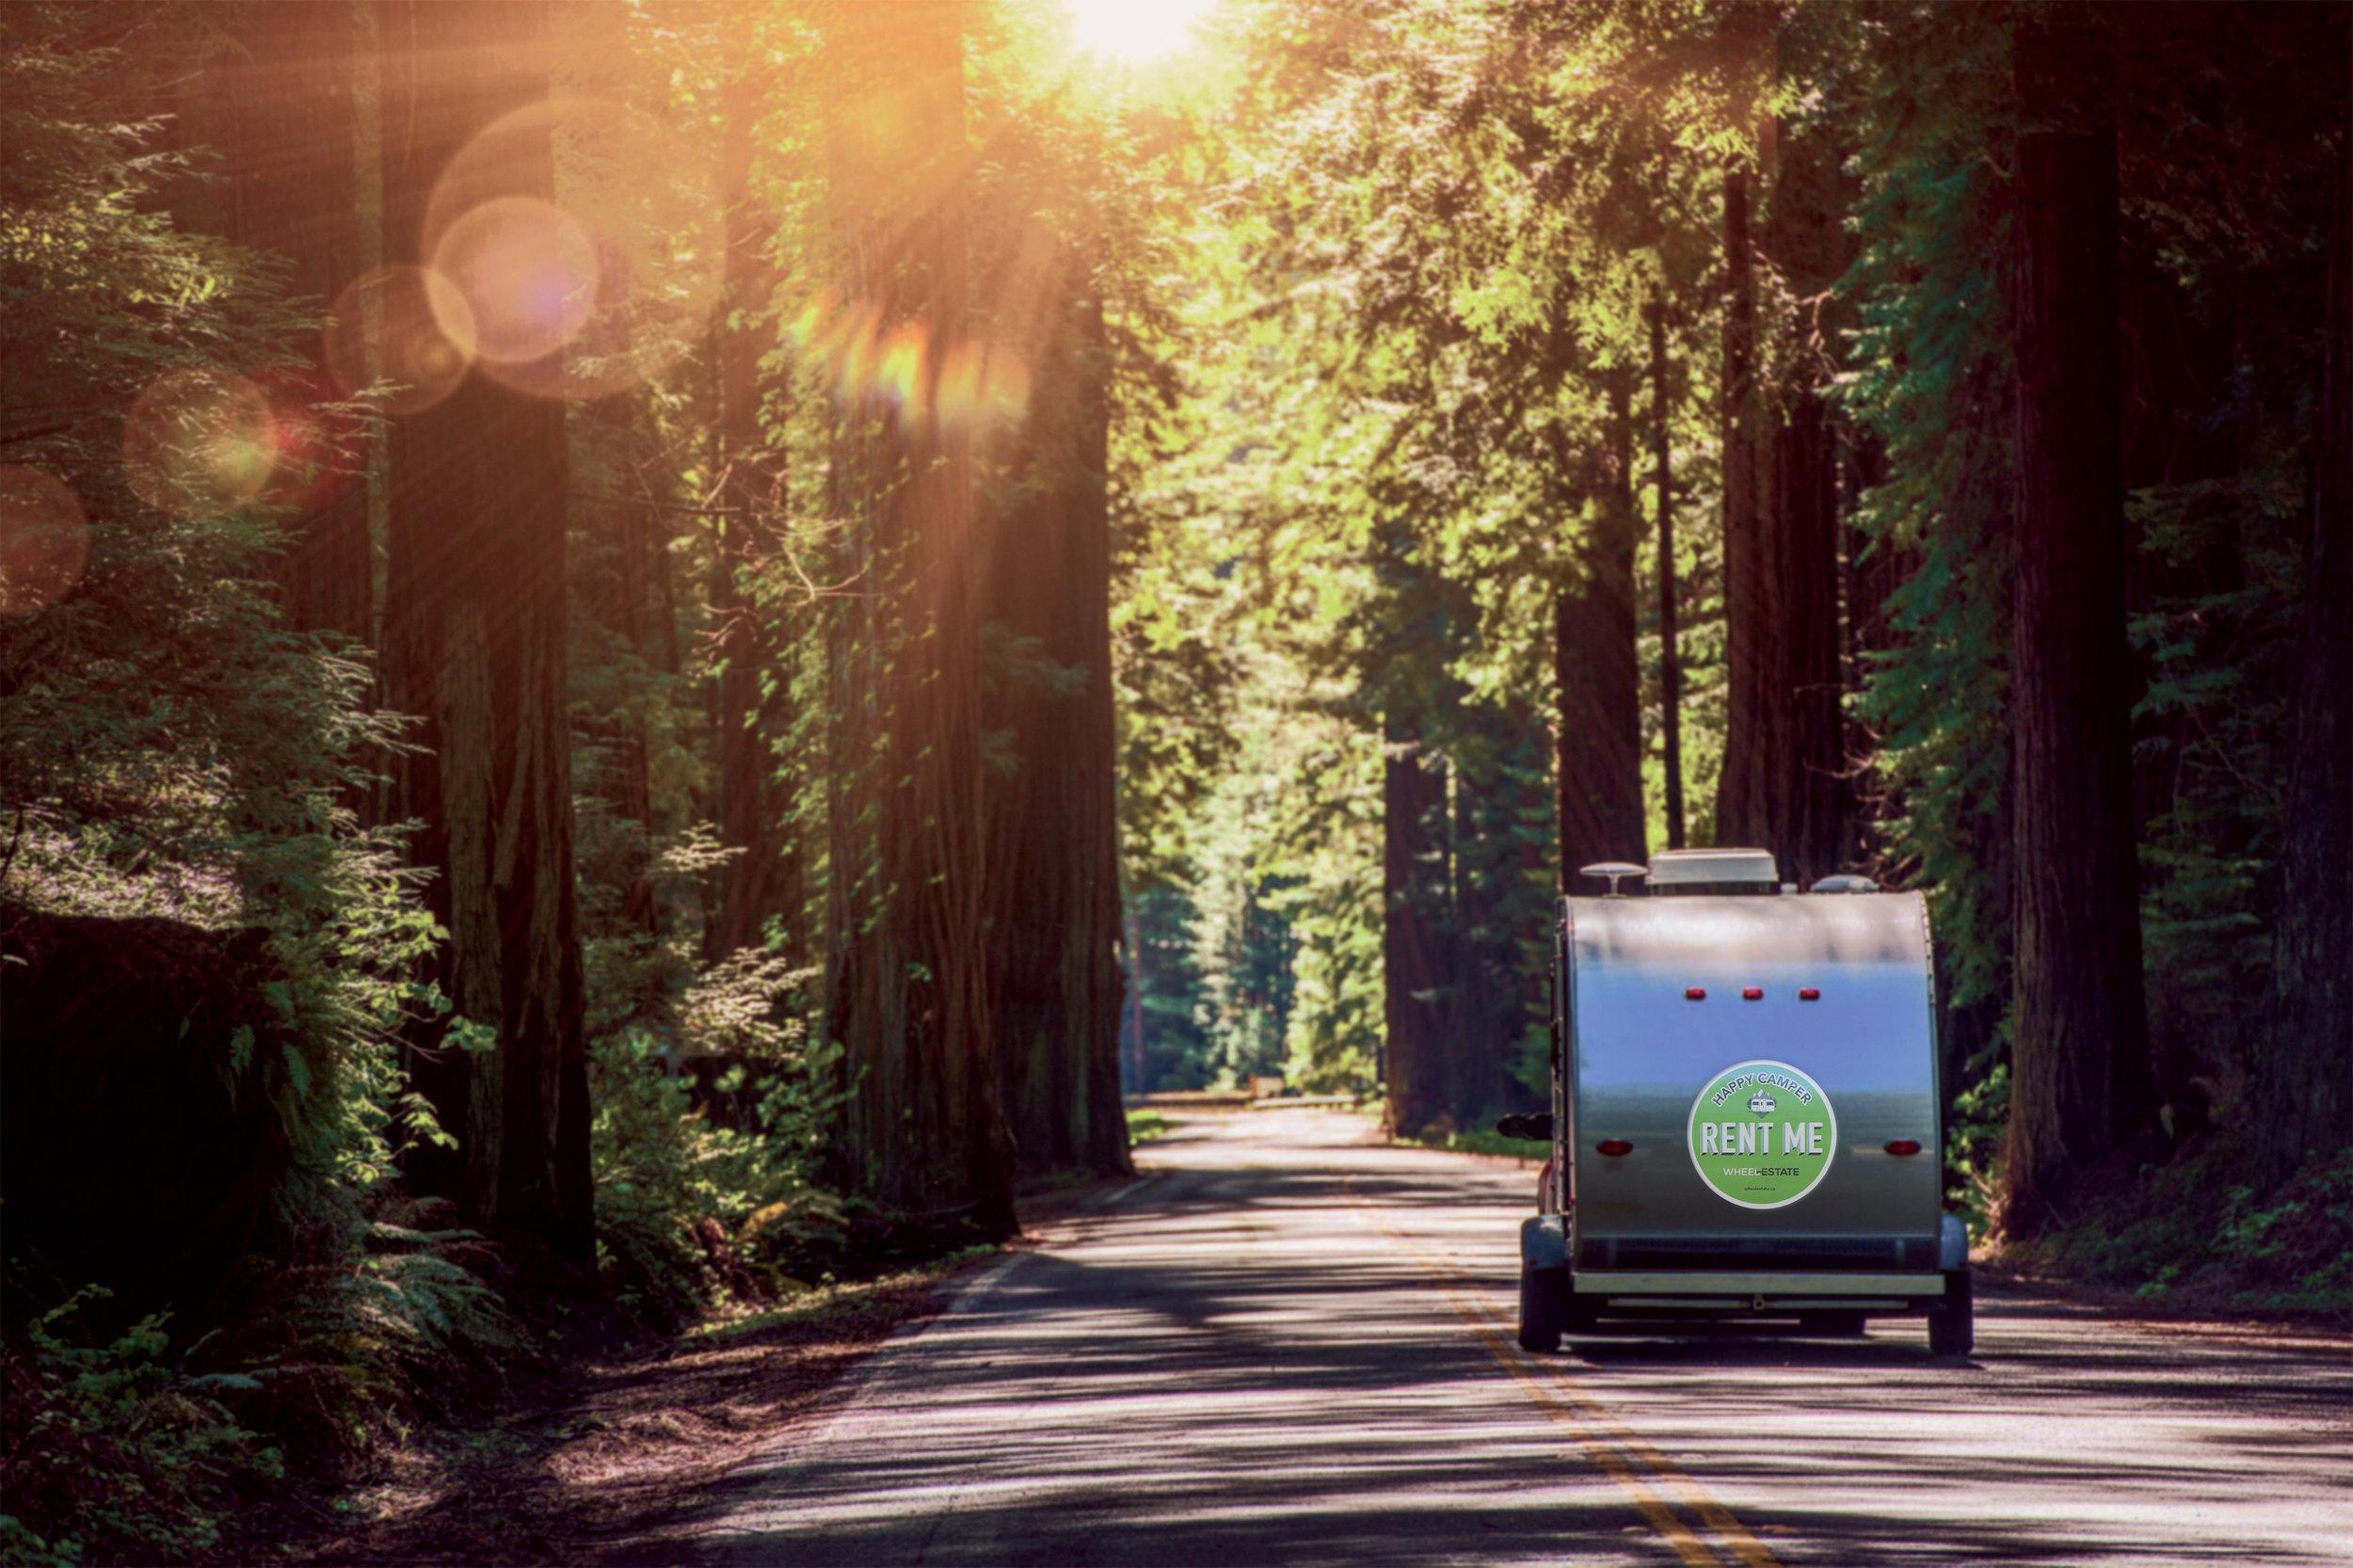 Camping-in-Redwoods-WE-sticker.jpg